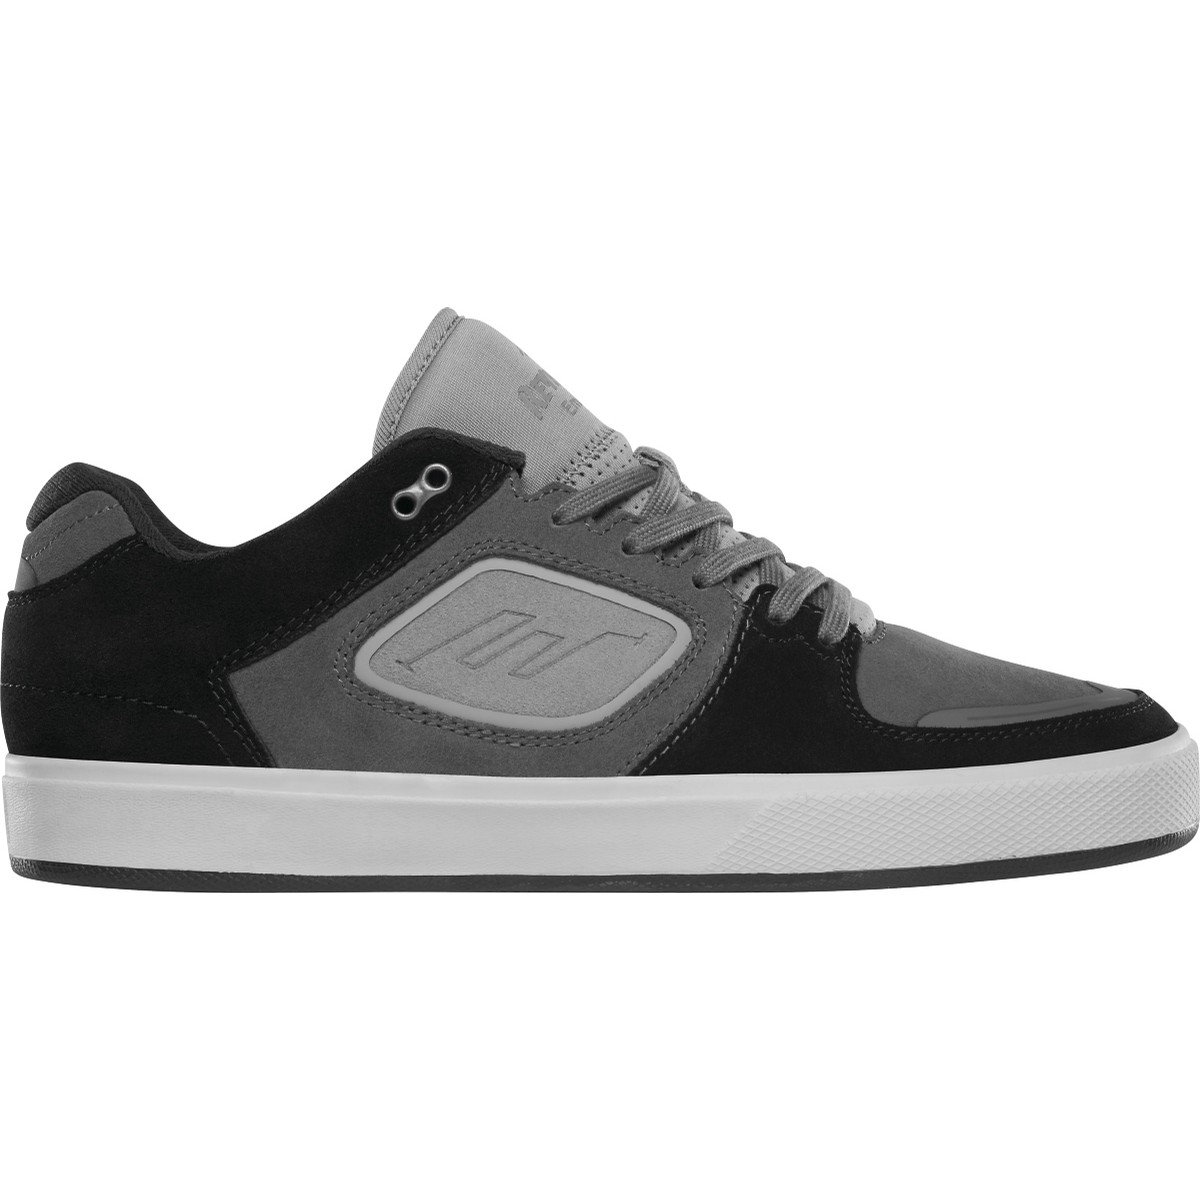 Reynolds G6 (Black/Grey)